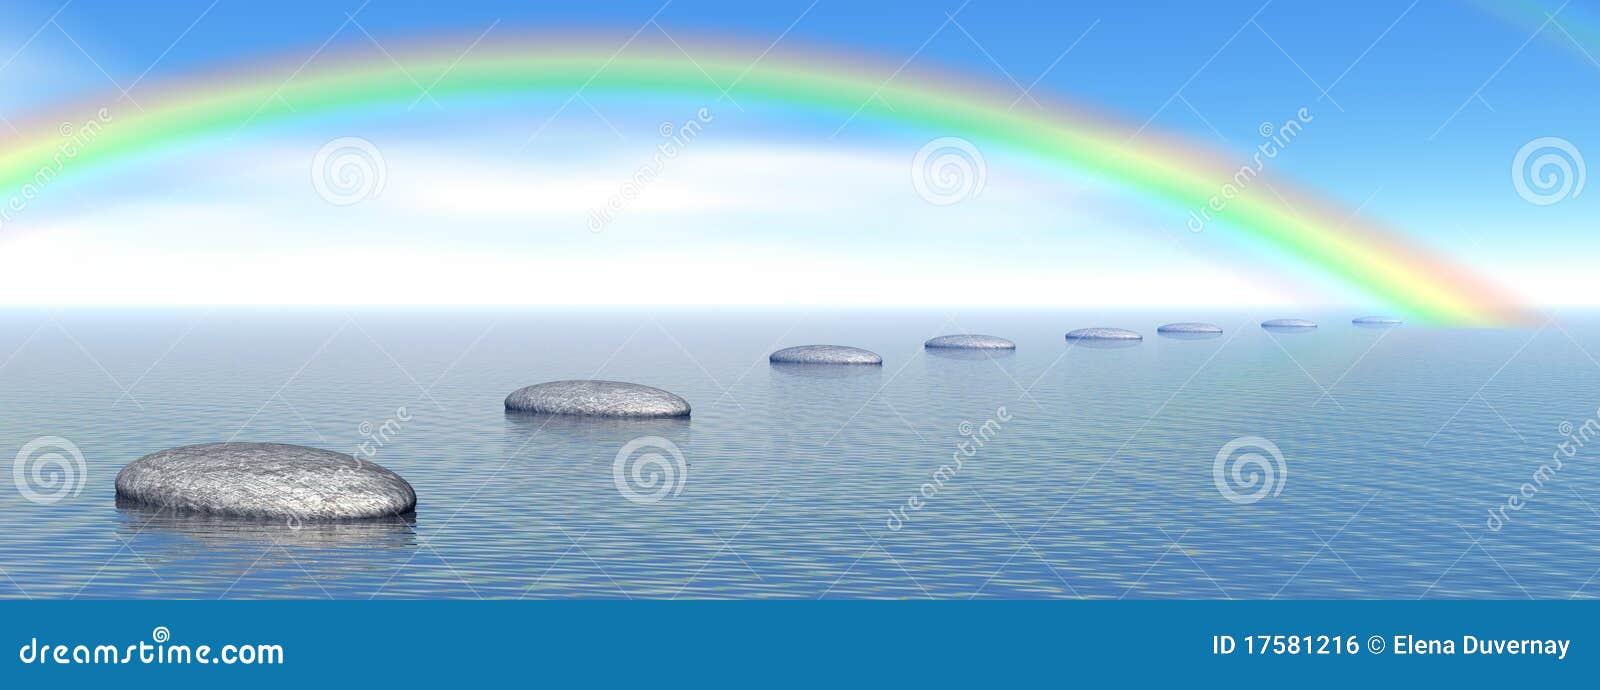 Steps to rainbow